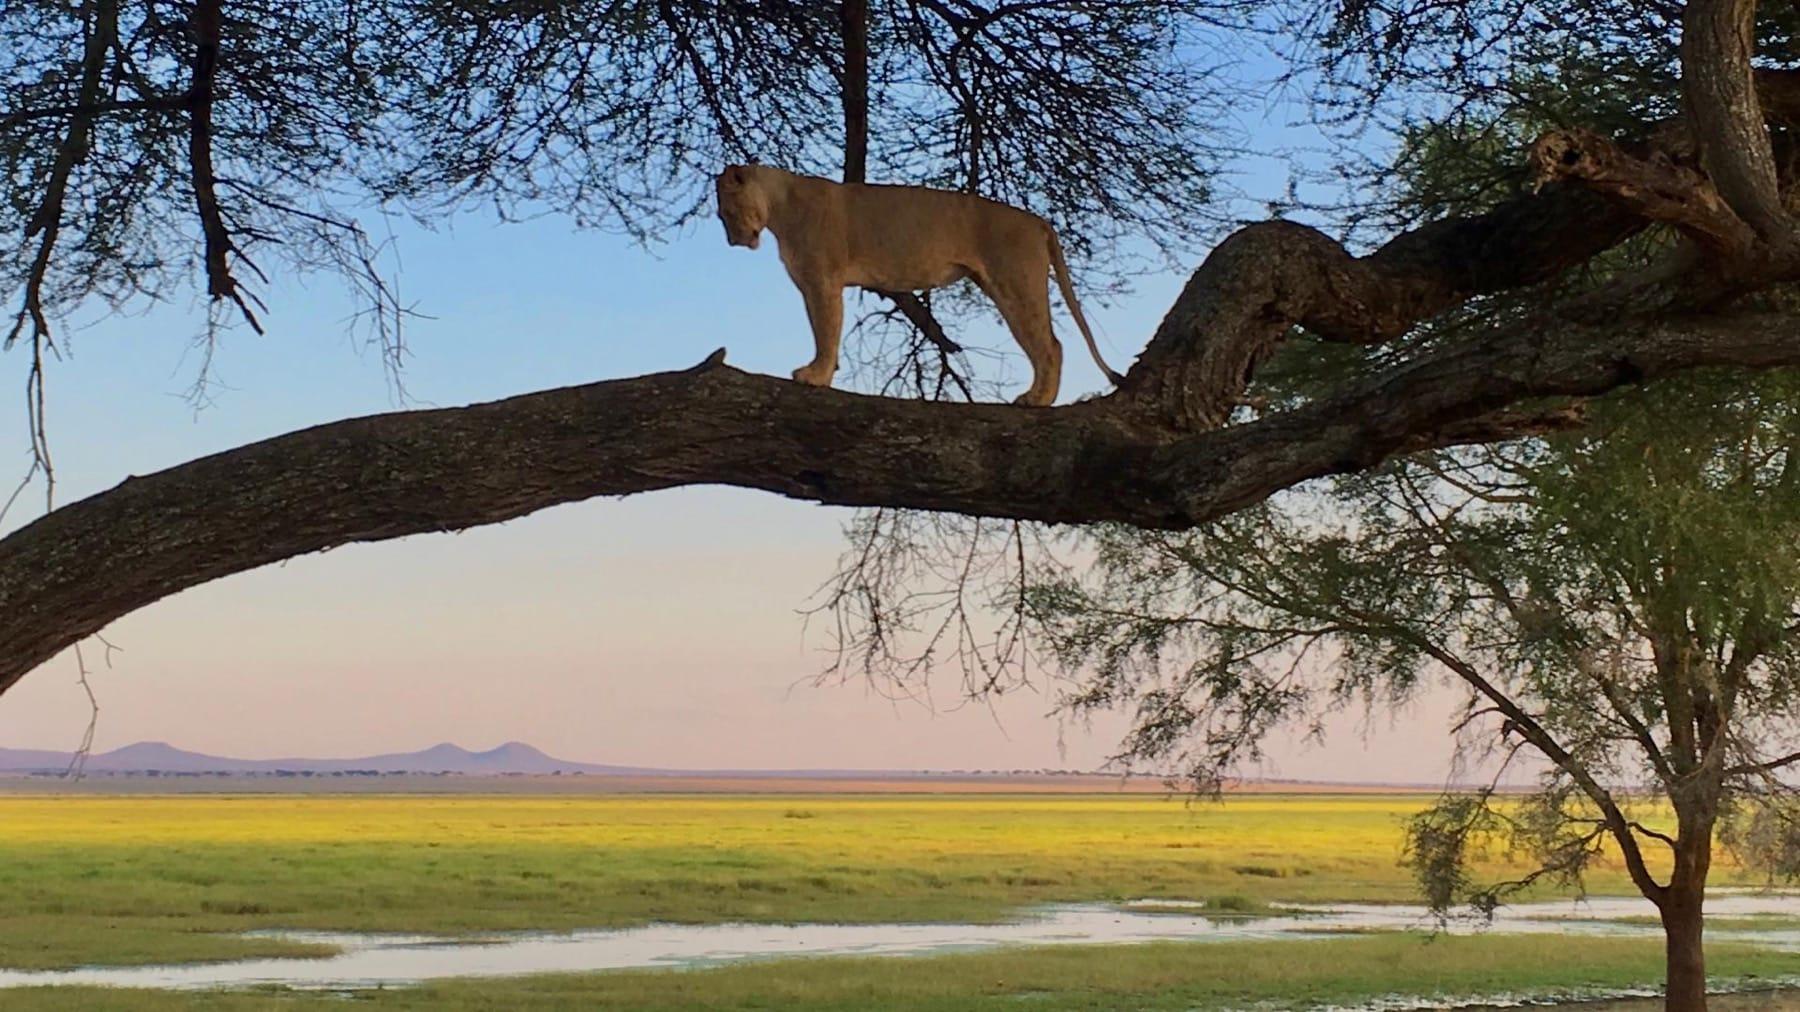 tree climbing lion tanzania safari